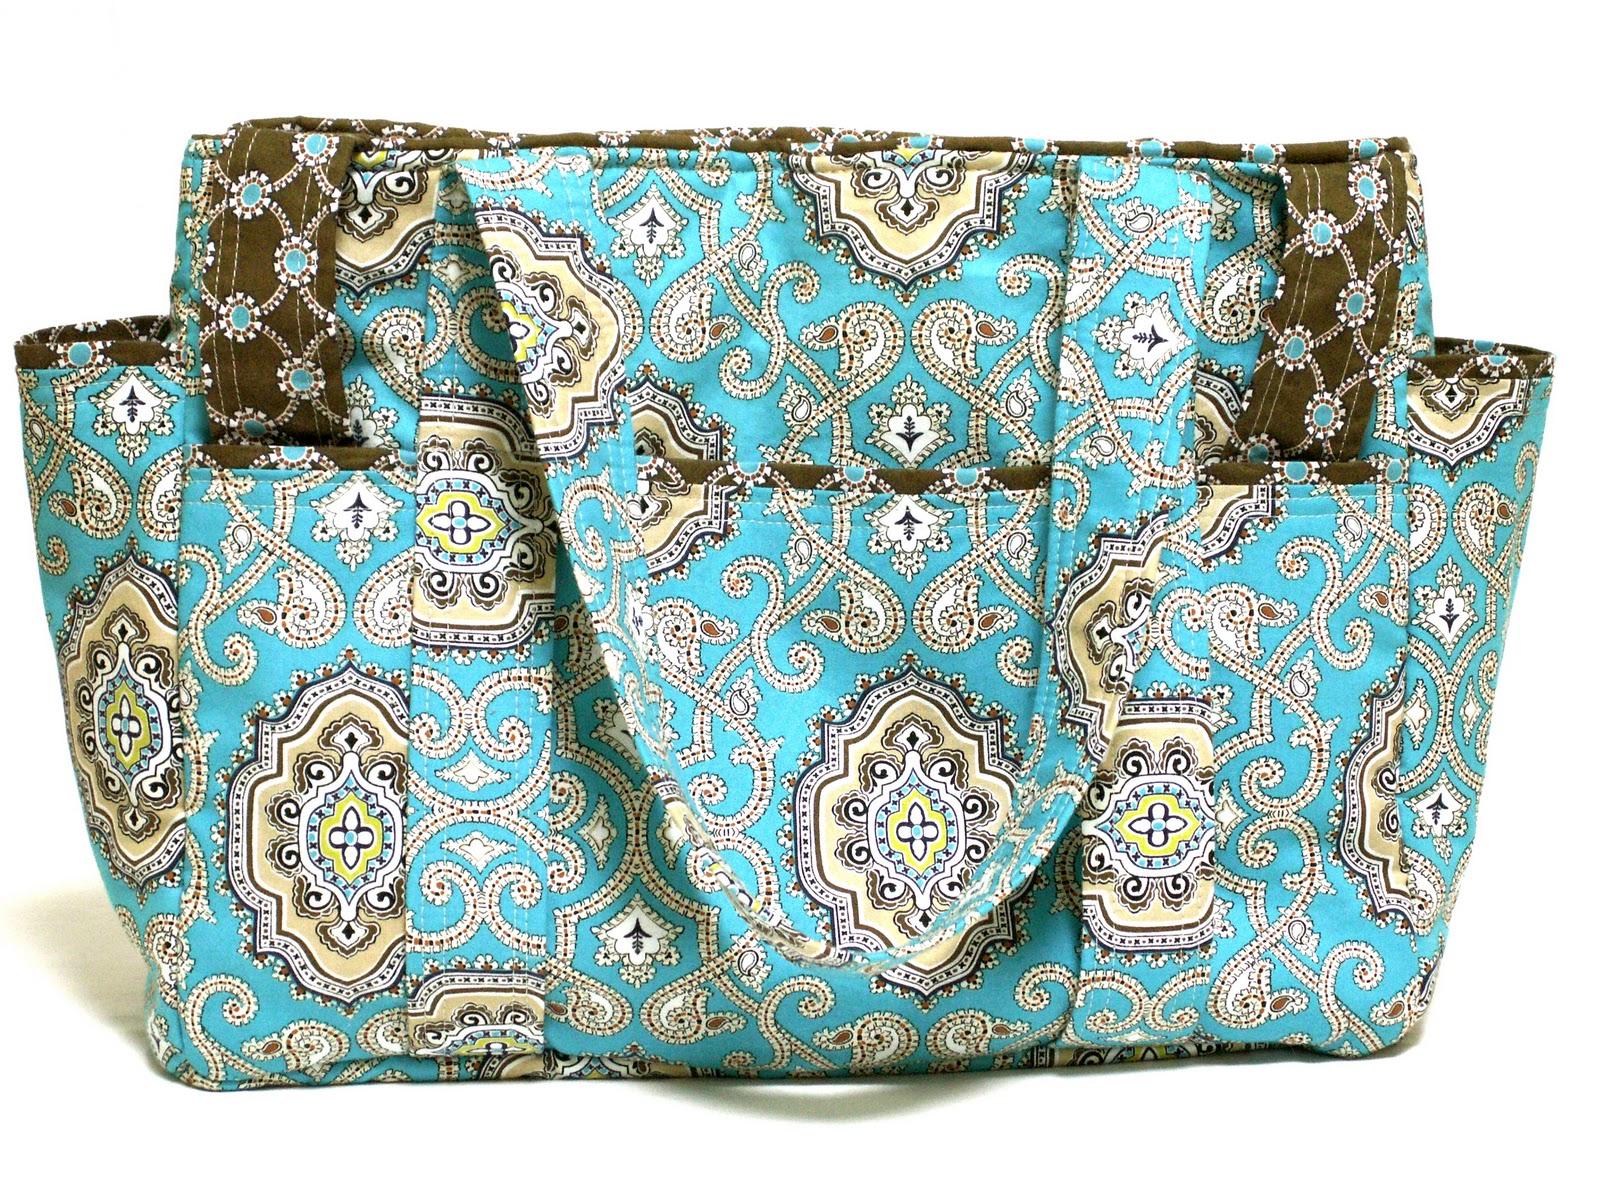 sweetiepies butterflies boutique diaper bags. Black Bedroom Furniture Sets. Home Design Ideas